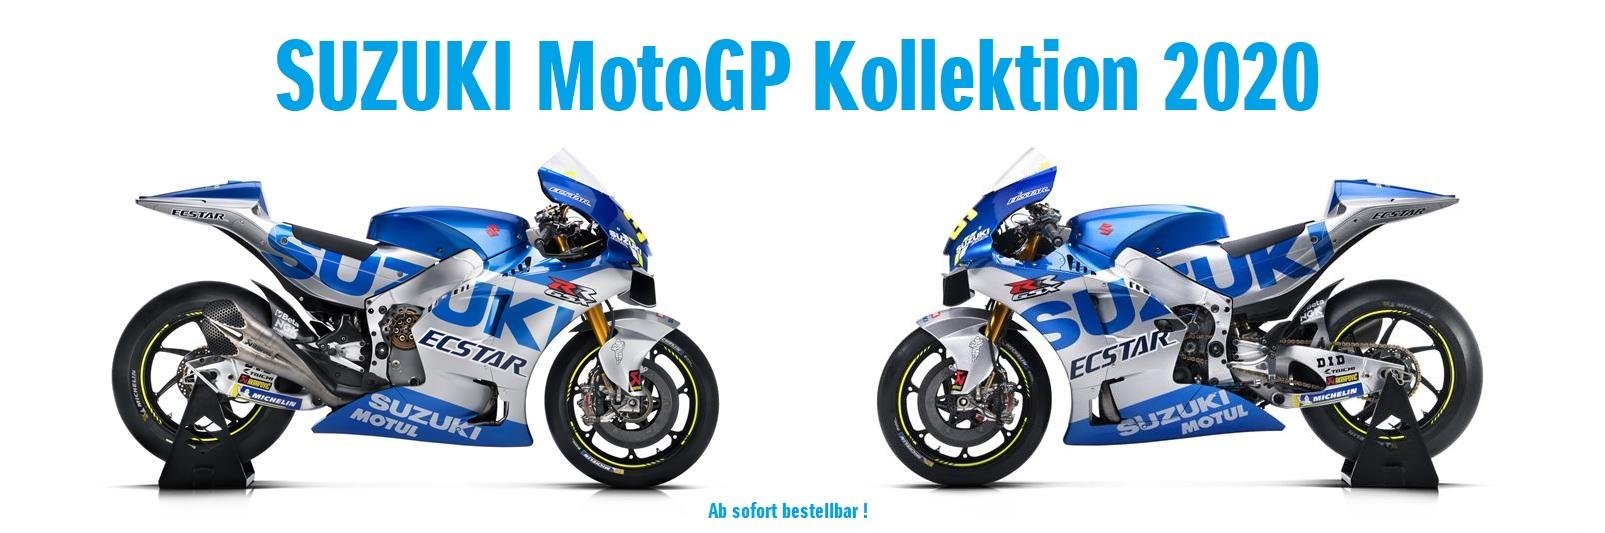 MotoGP Kollektion 2020